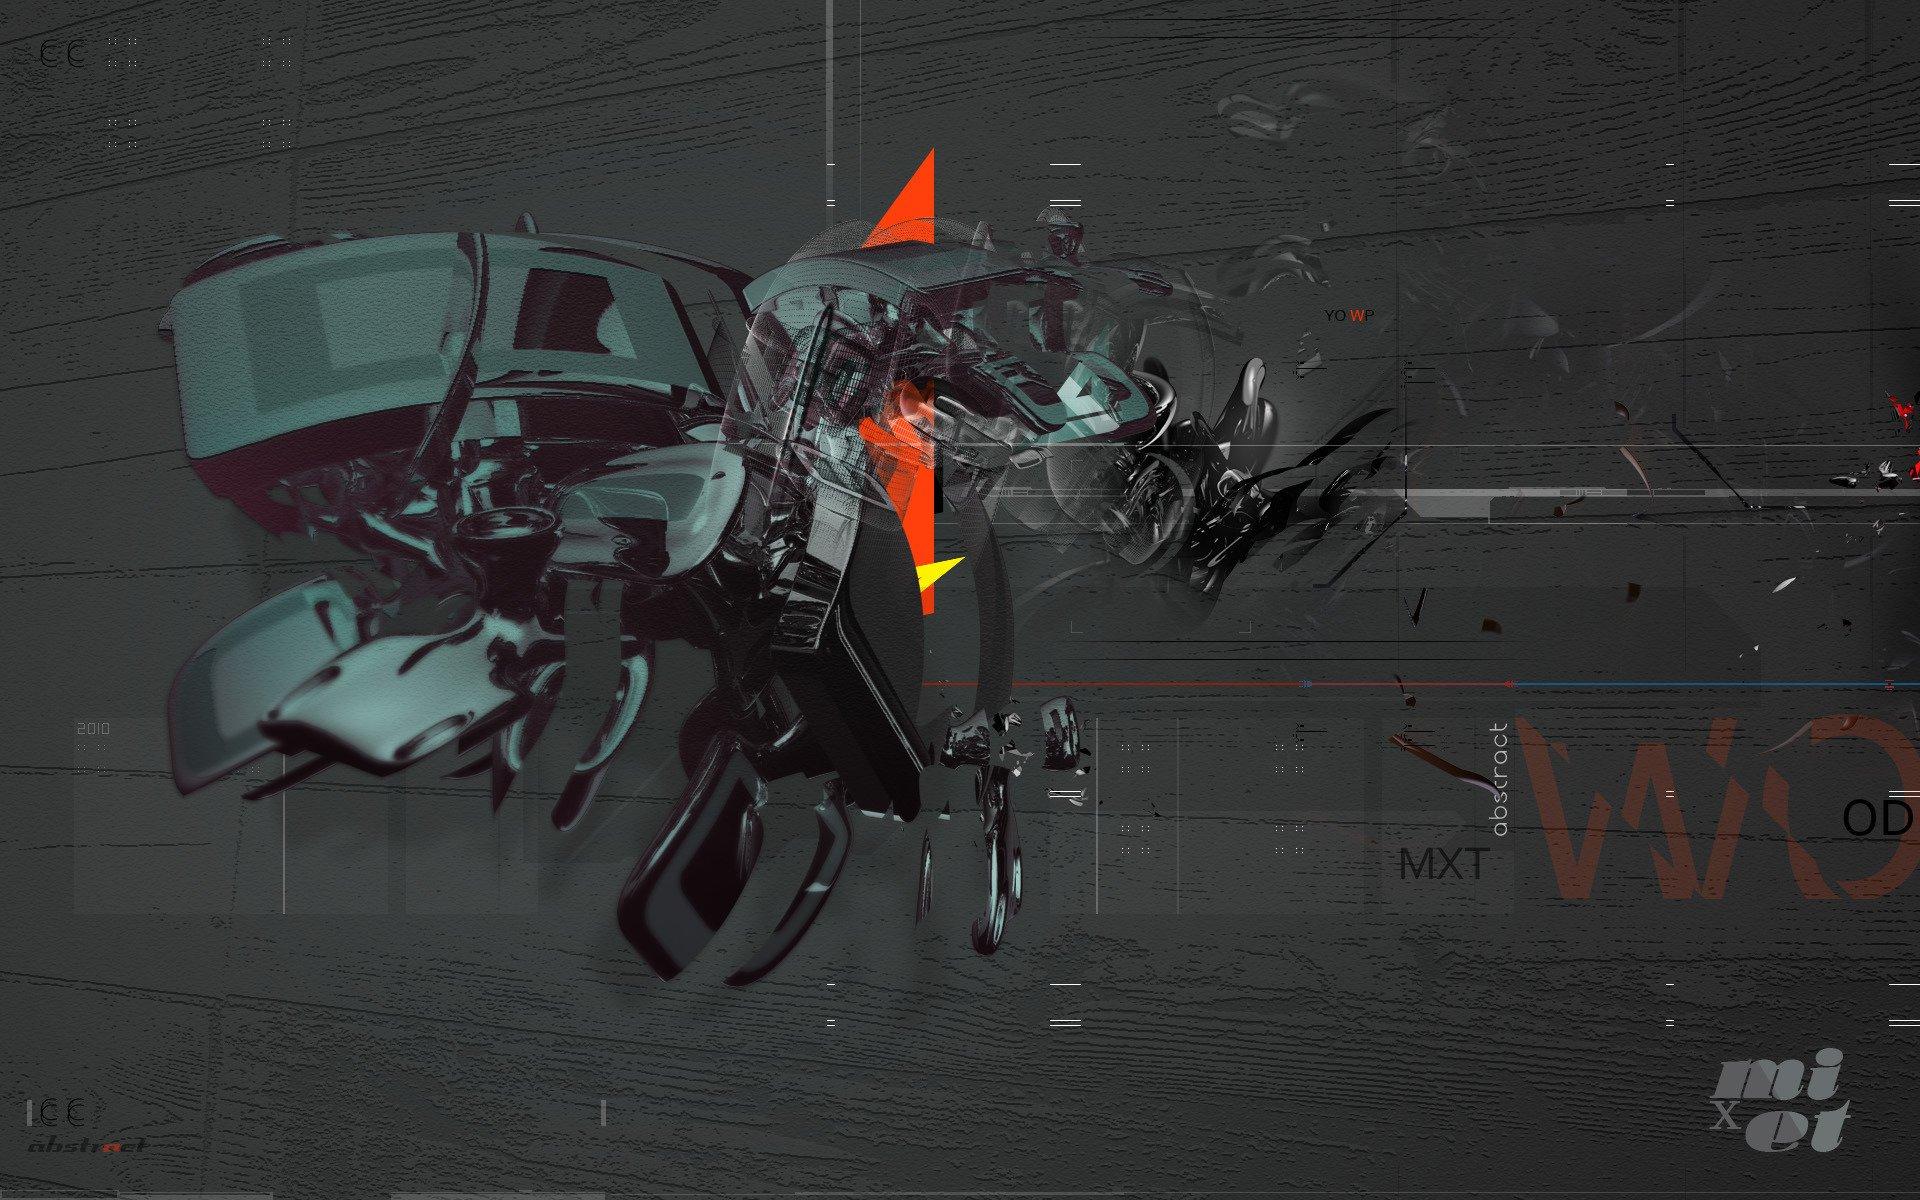 wallpaper 1366 x 786 hd,pc game,vehicle,screenshot,digital compositing,fictional character